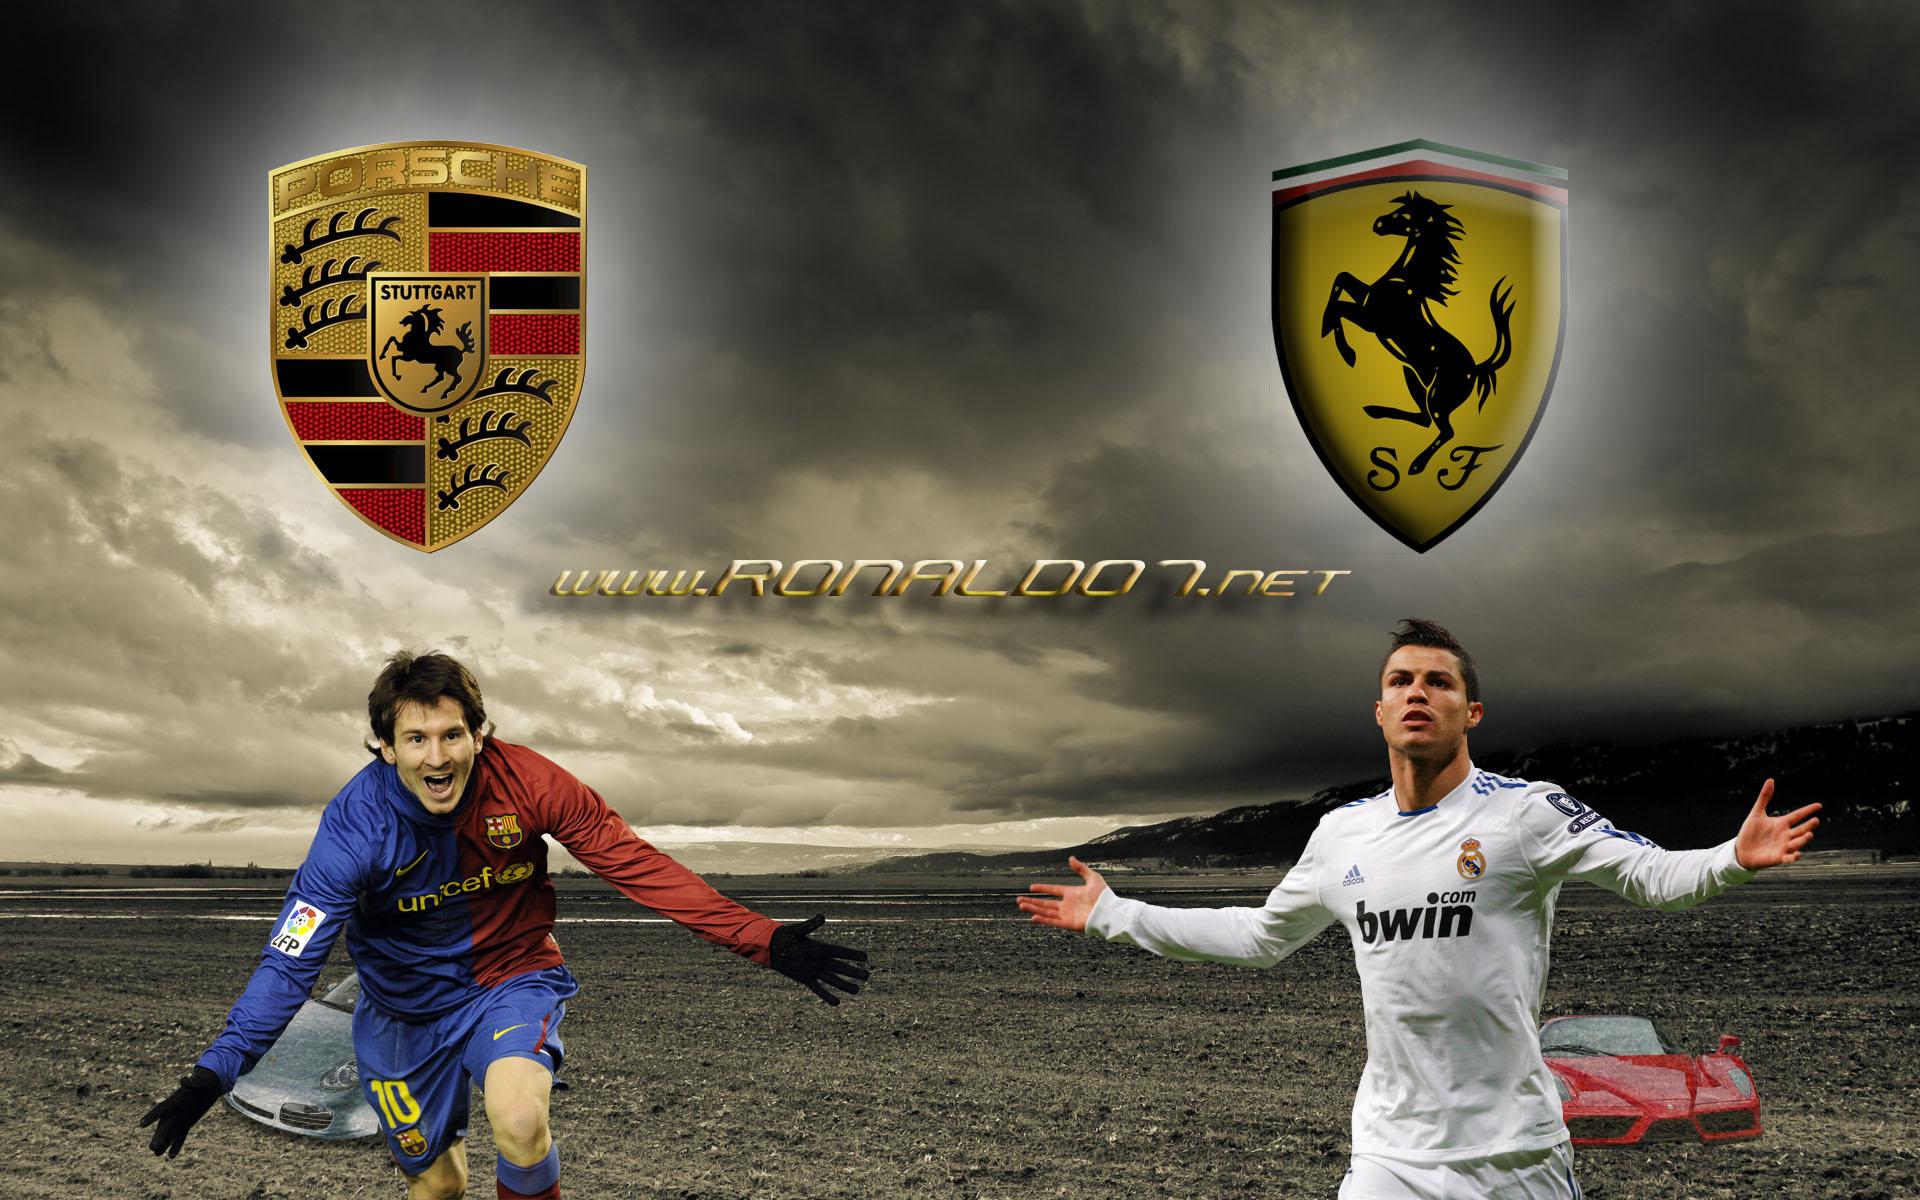 Messi Ronaldo Neymar Wallpapers 4kwallpaper Org